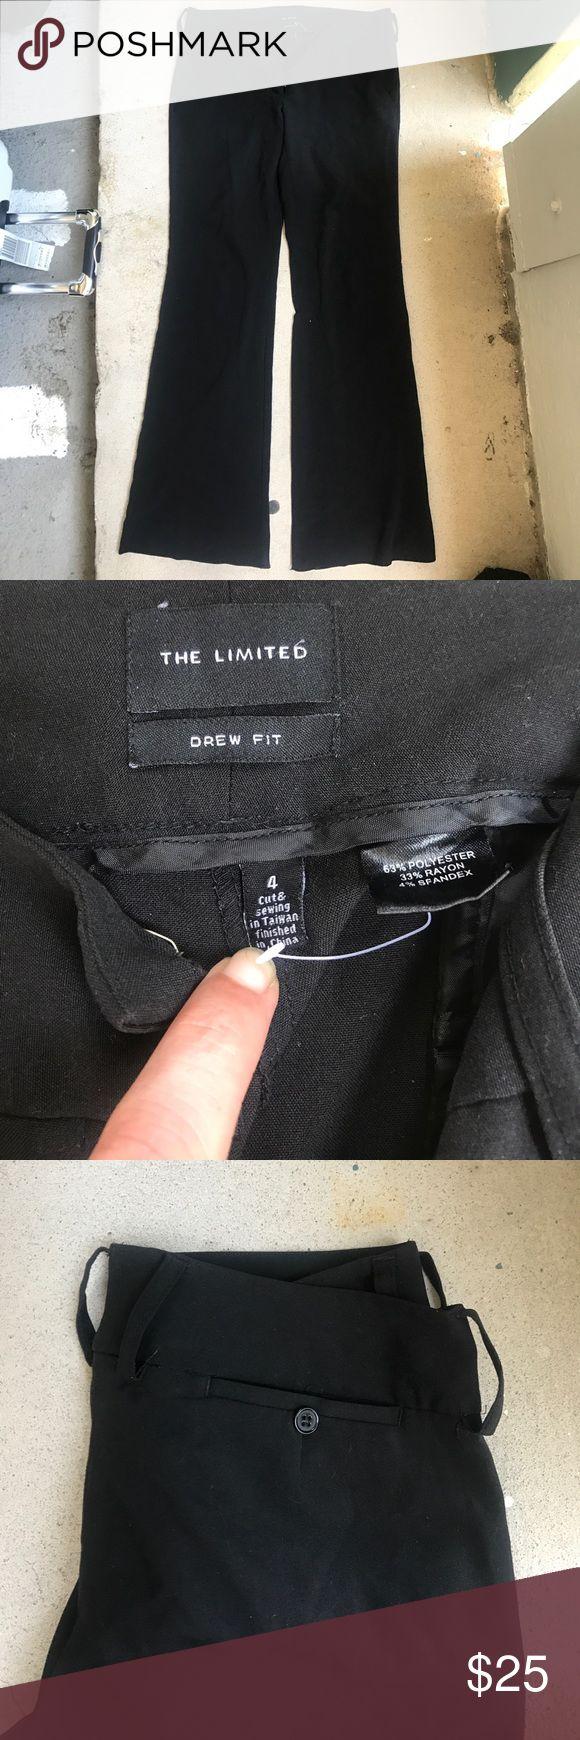 Limited drew fit 4 black trouser pants Limited drew fit 4 black trouser pants The Limited Pants Trousers